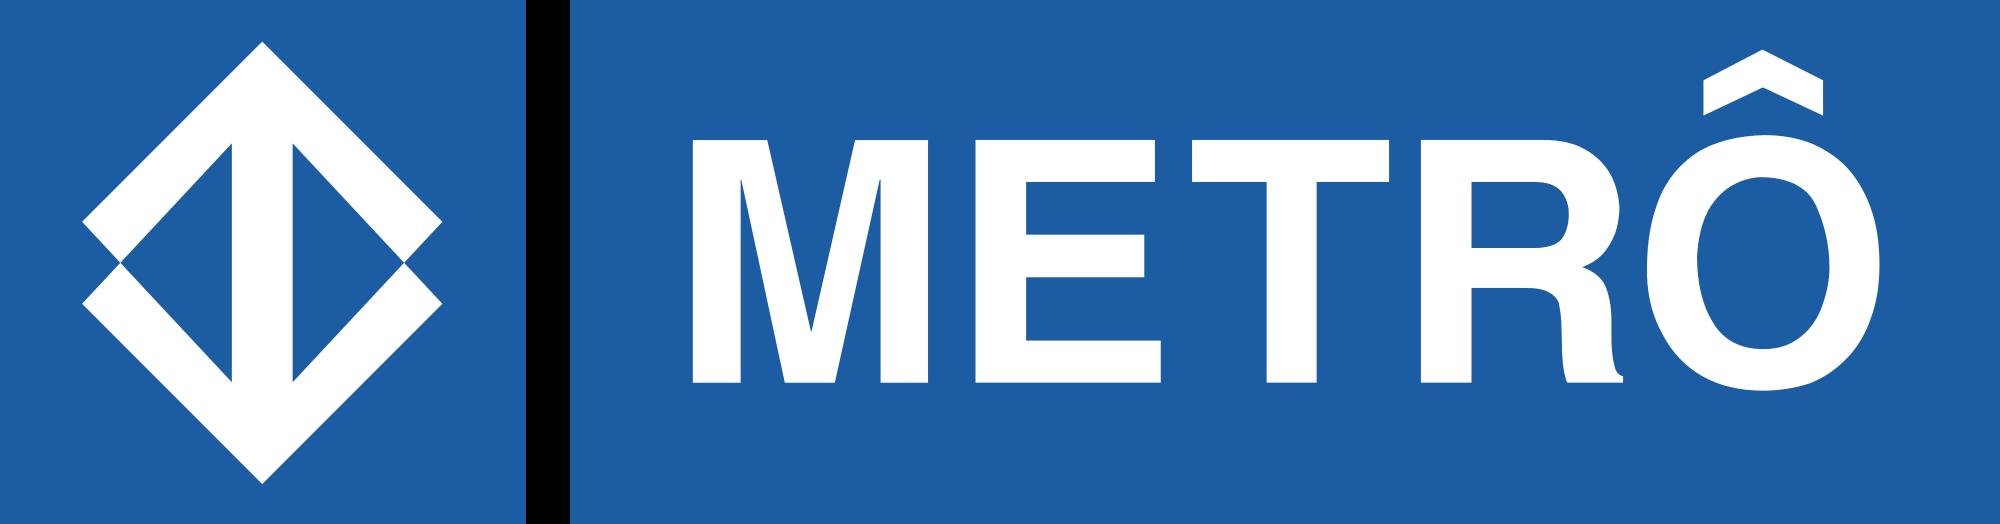 Metro Sp